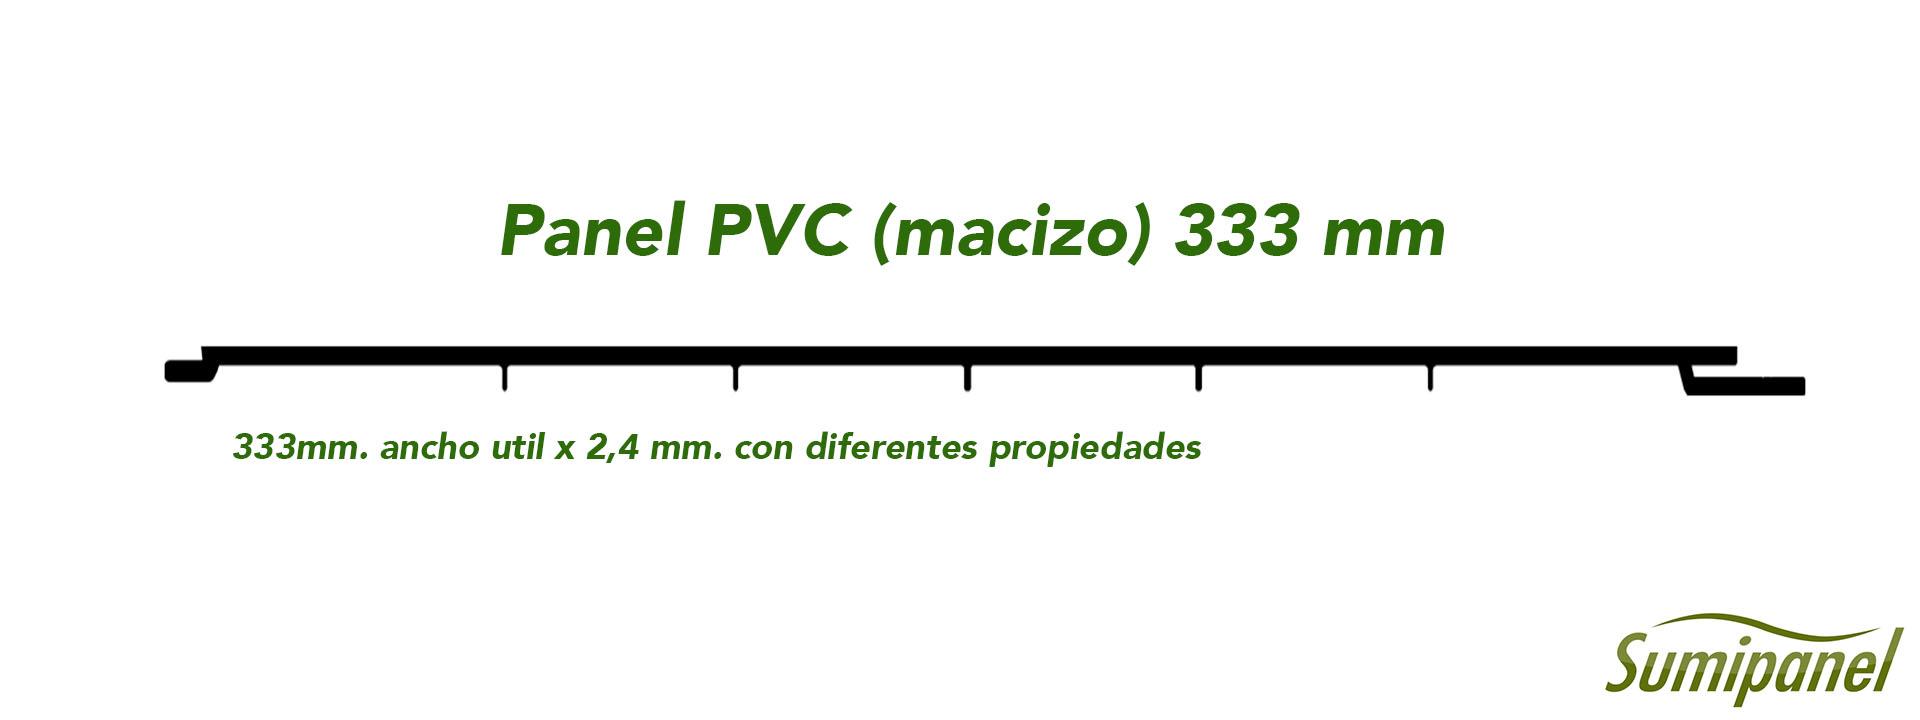 Panel PVC Macizo